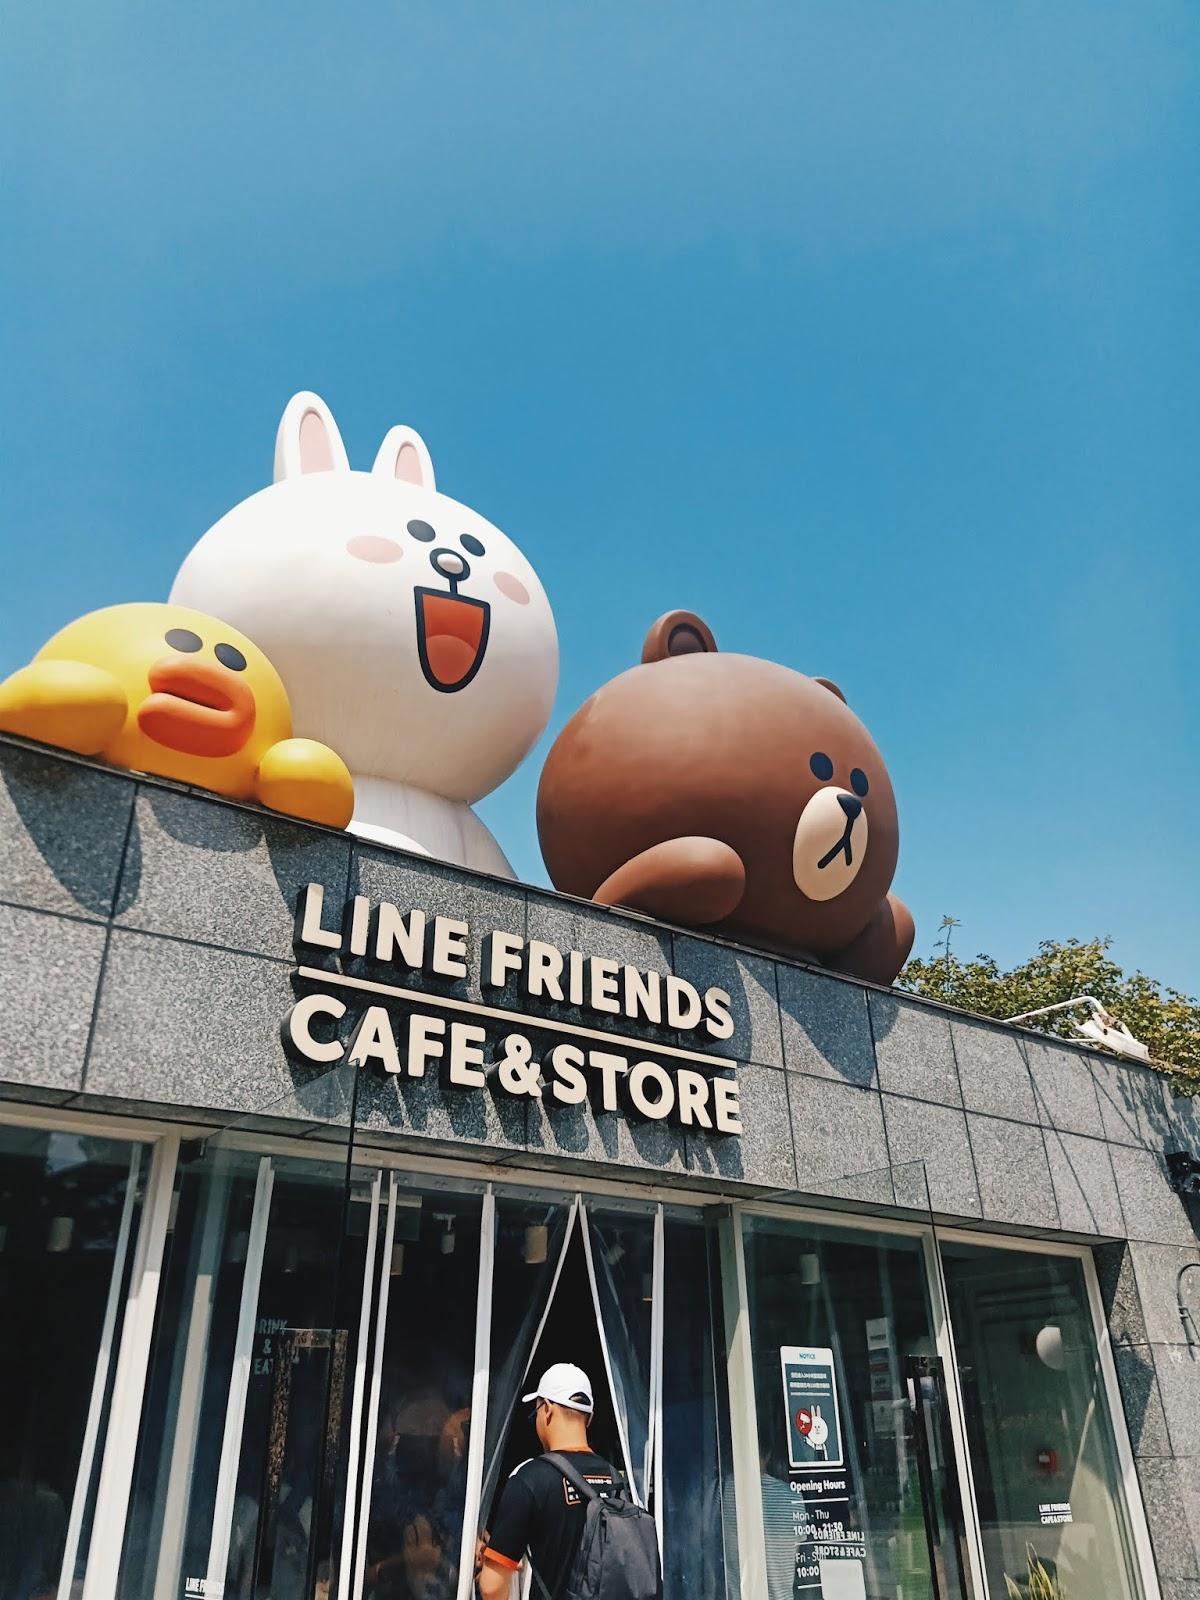 Line Cafe, Nanjing